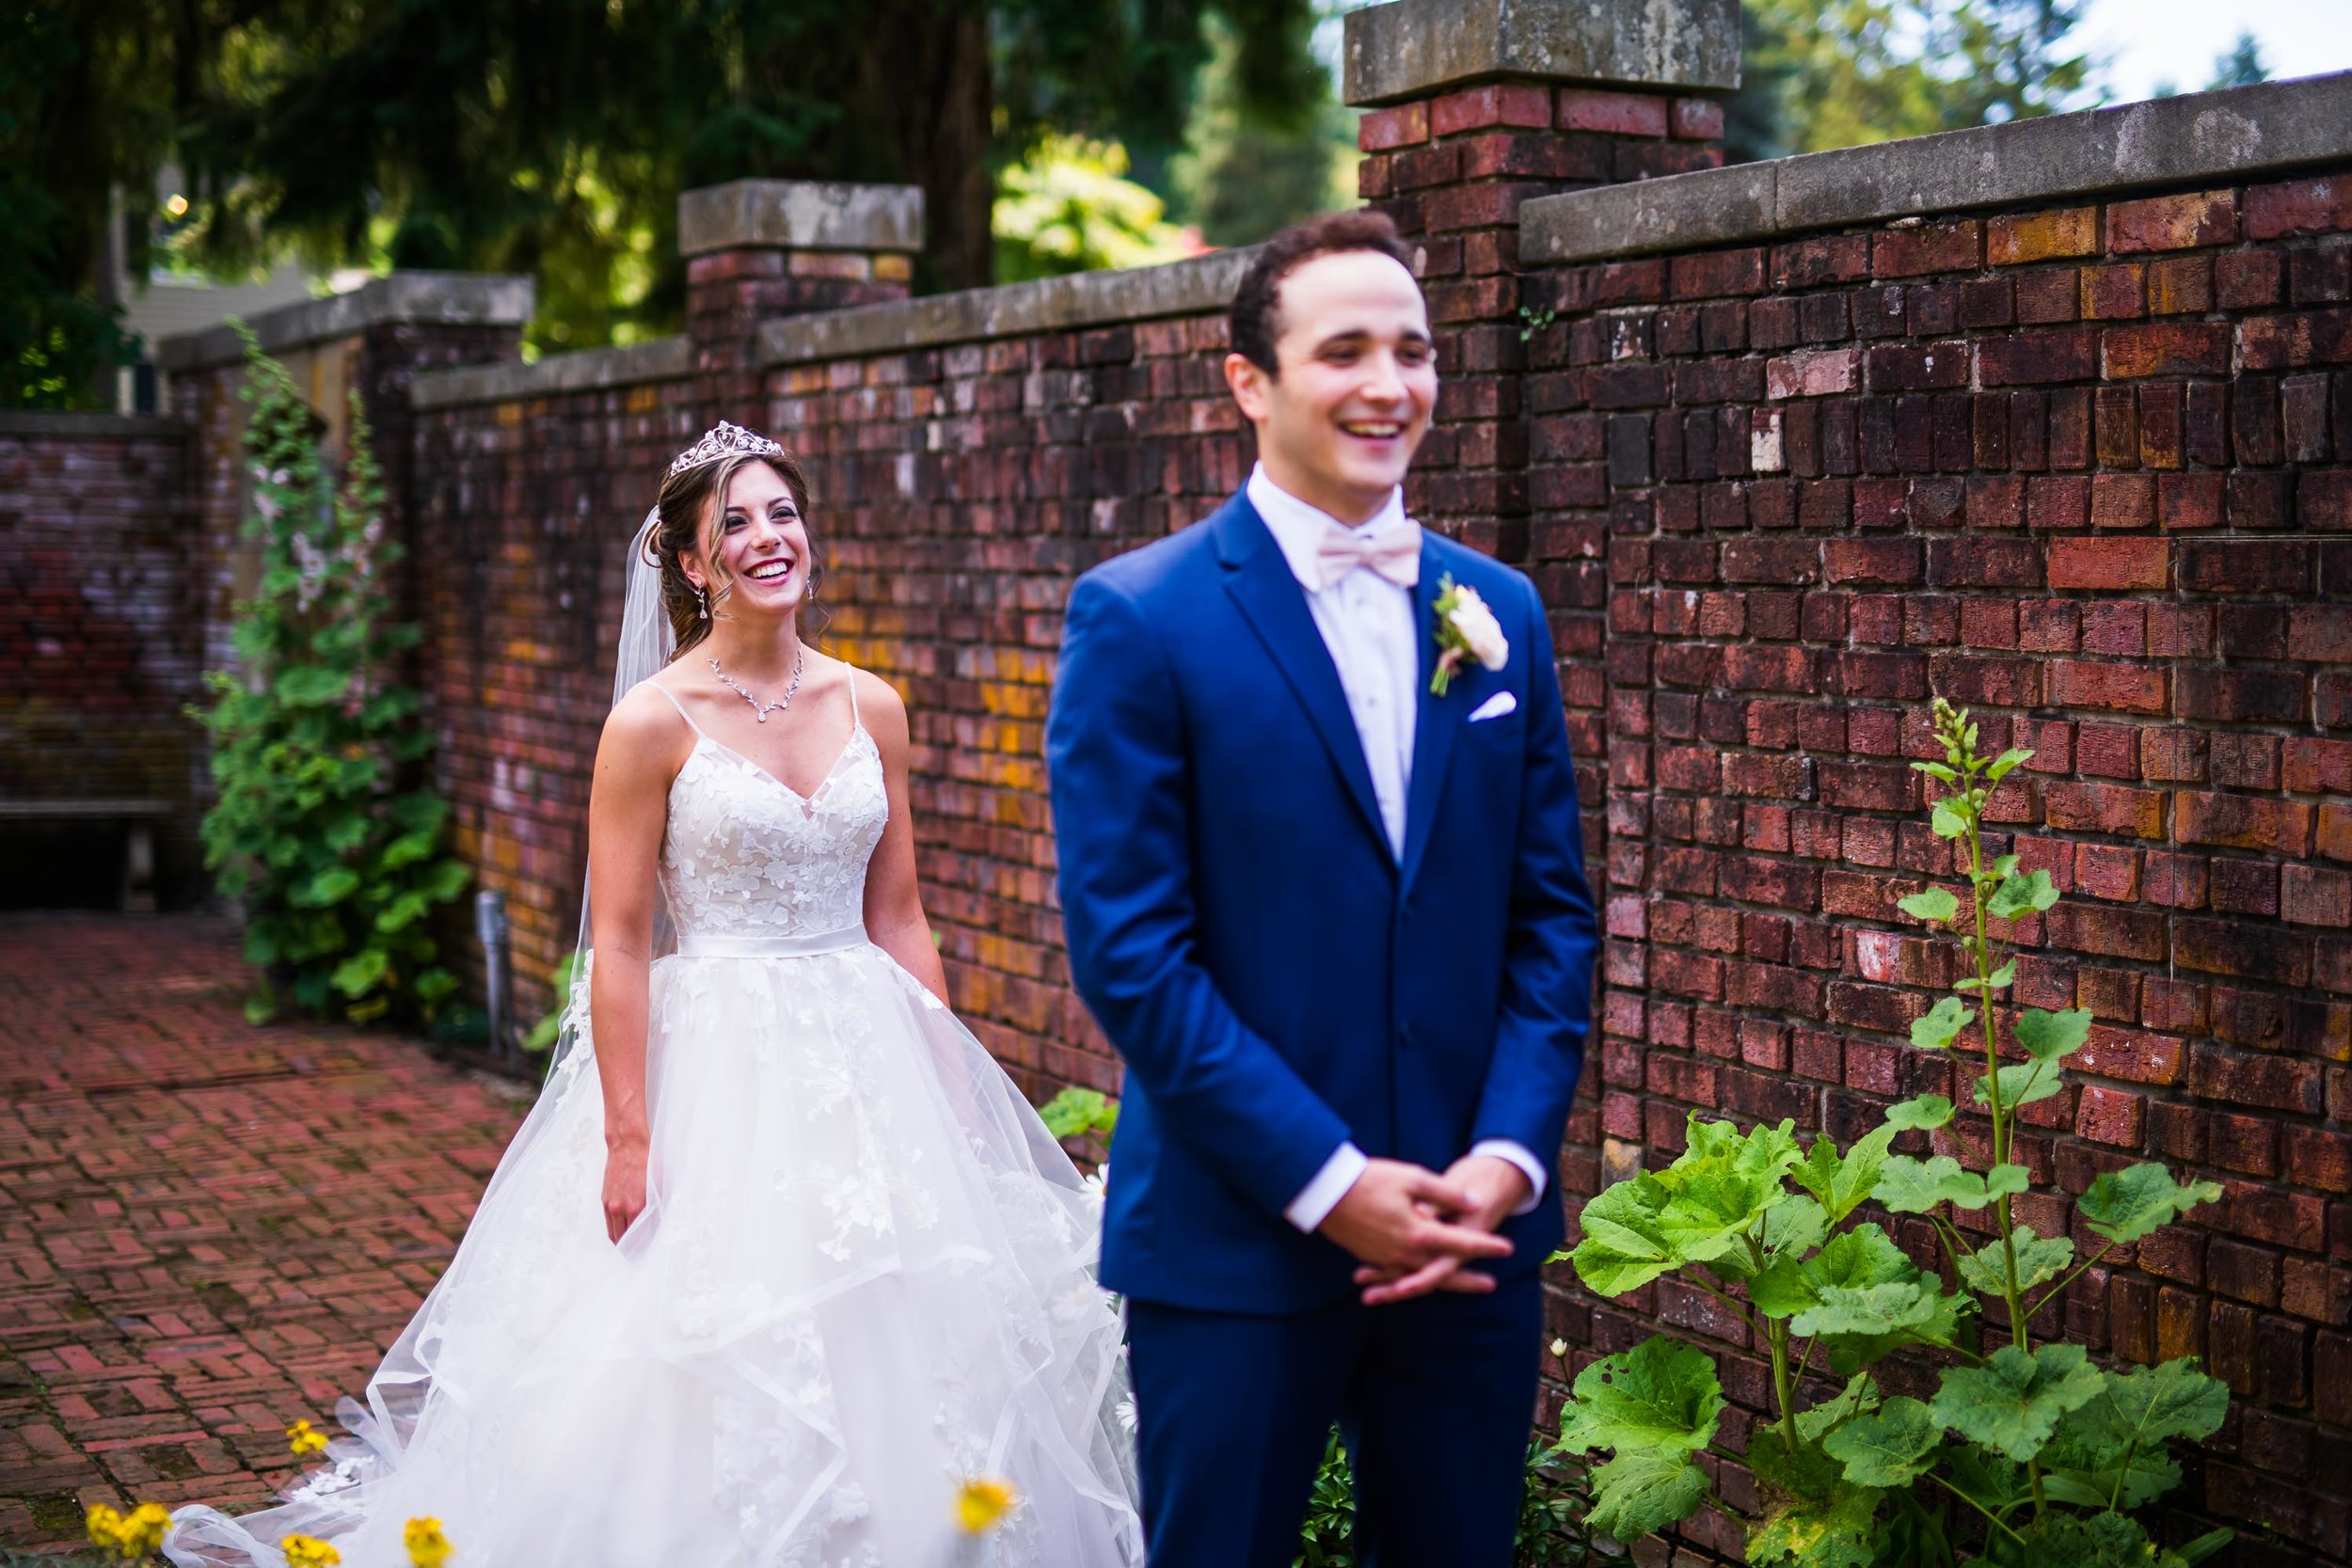 thornewood castle wedding 12.jpg